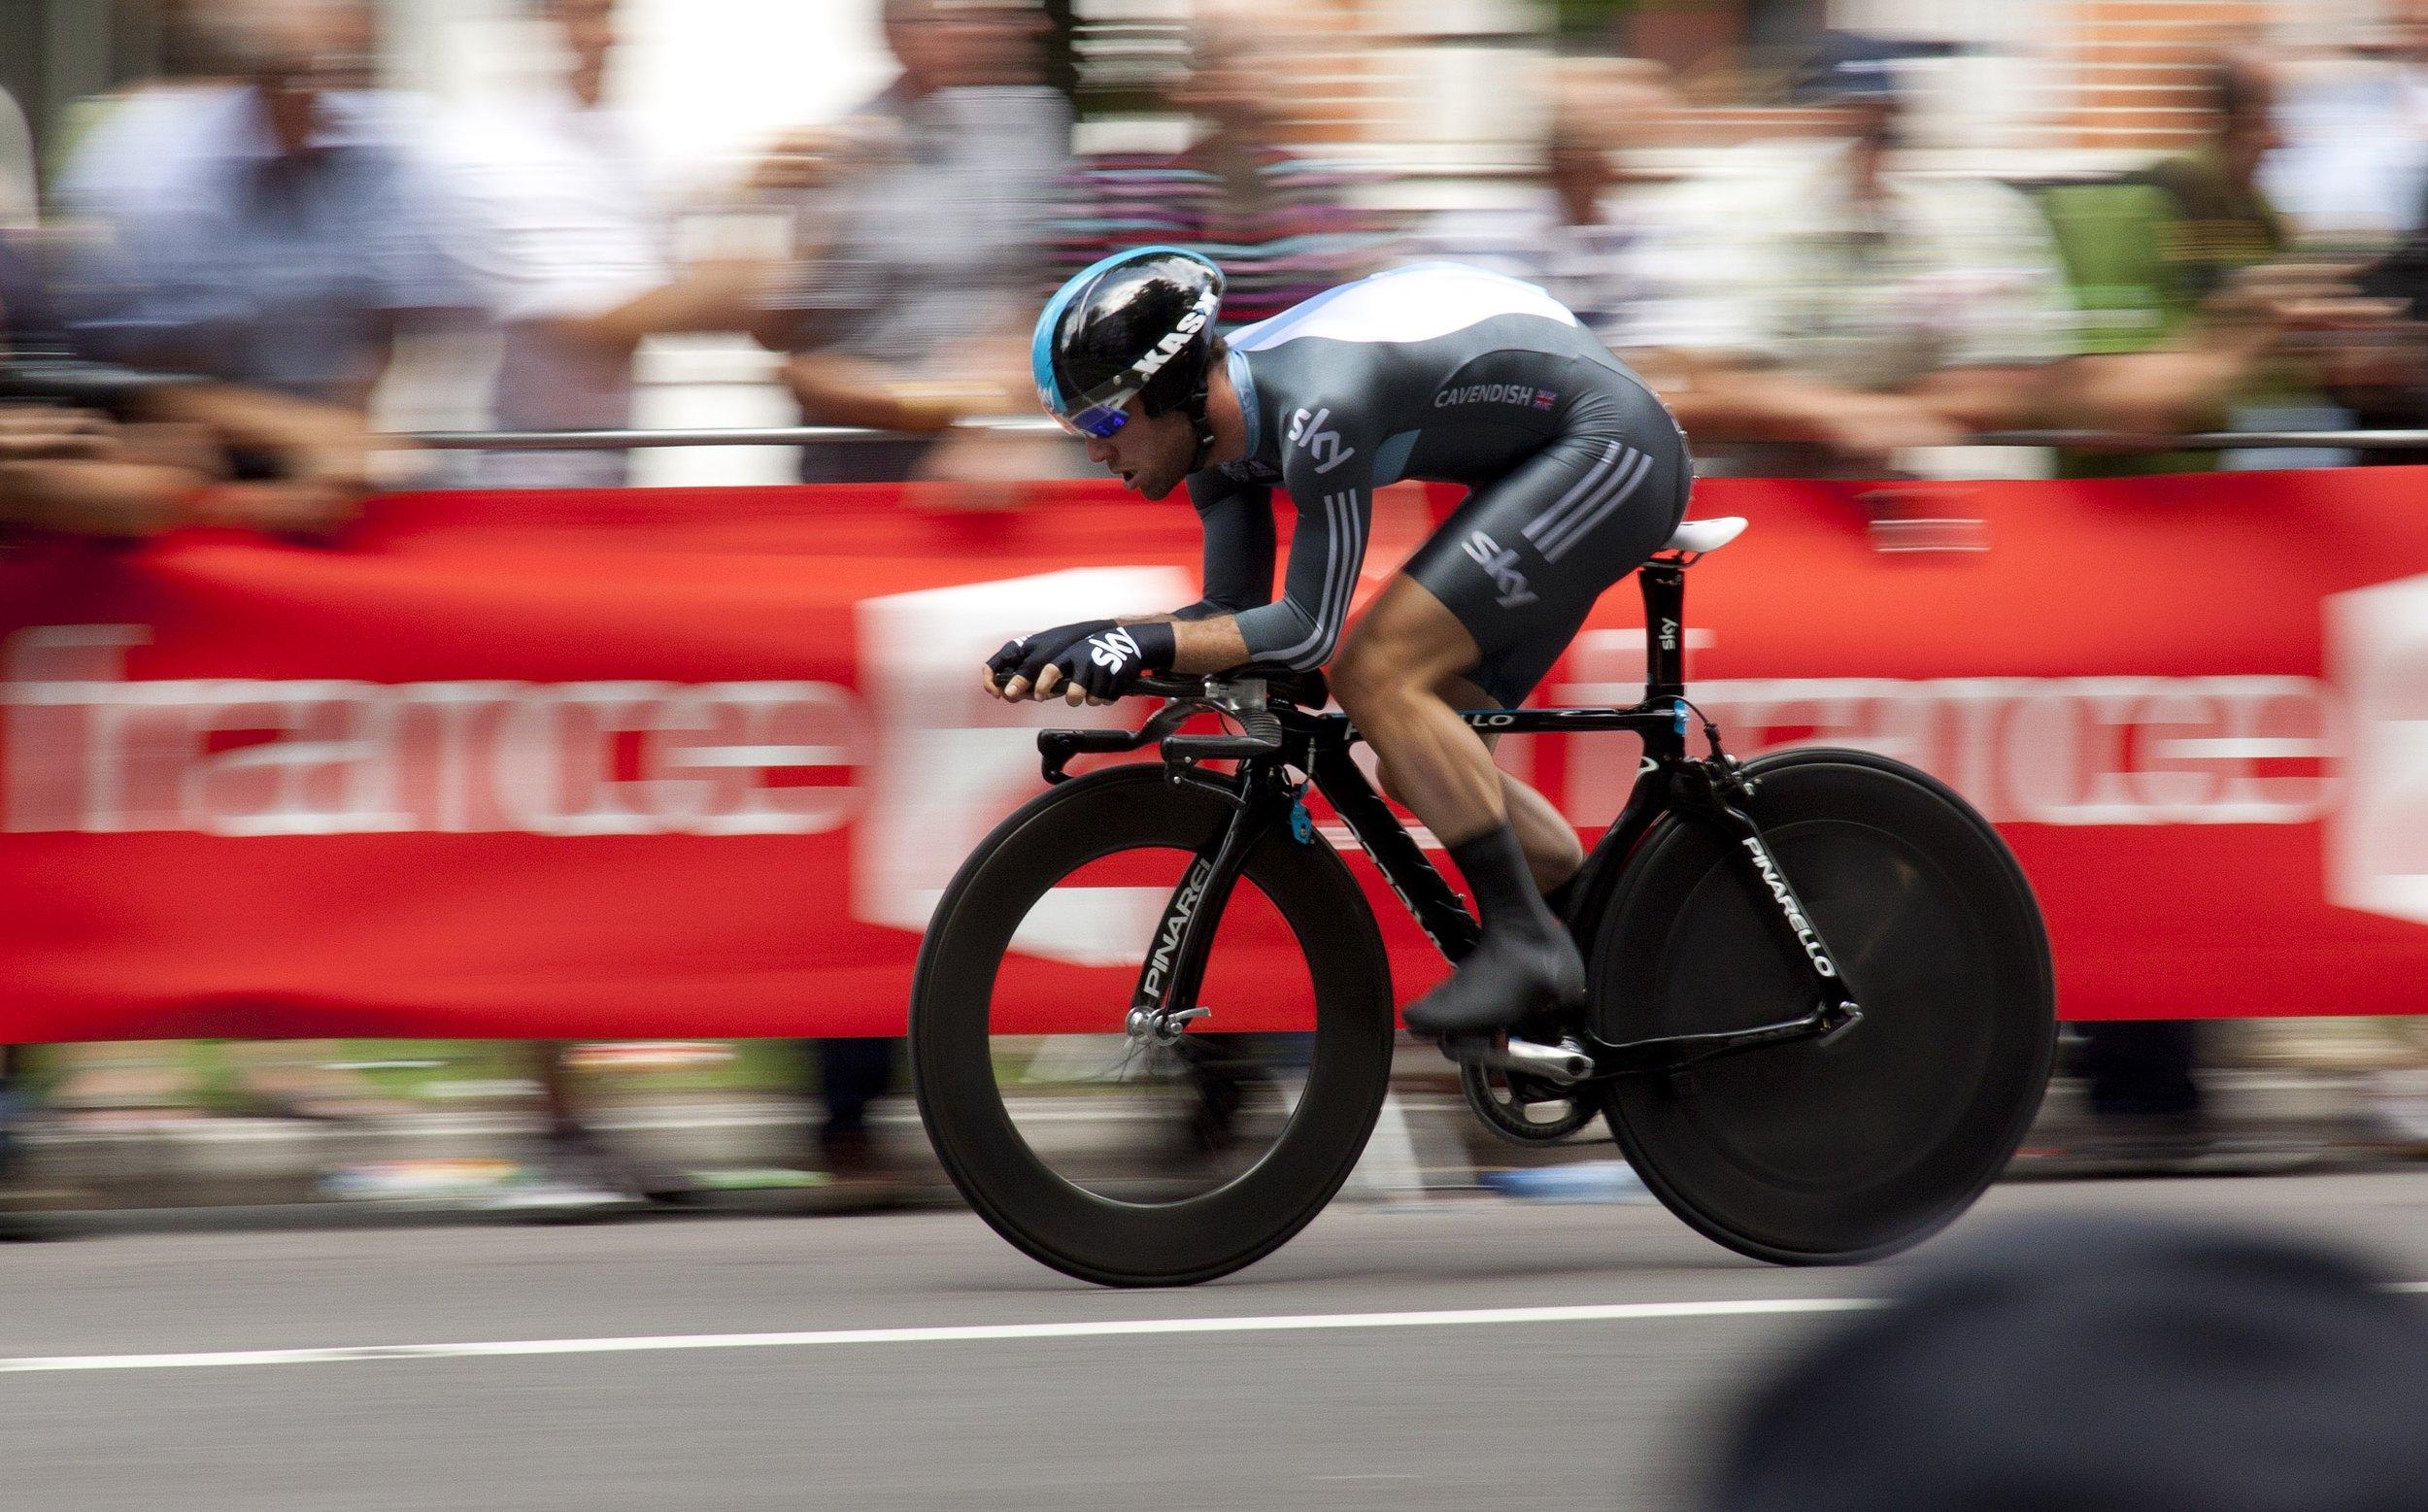 tt-cyclist-641675-pxhere.com.jpg